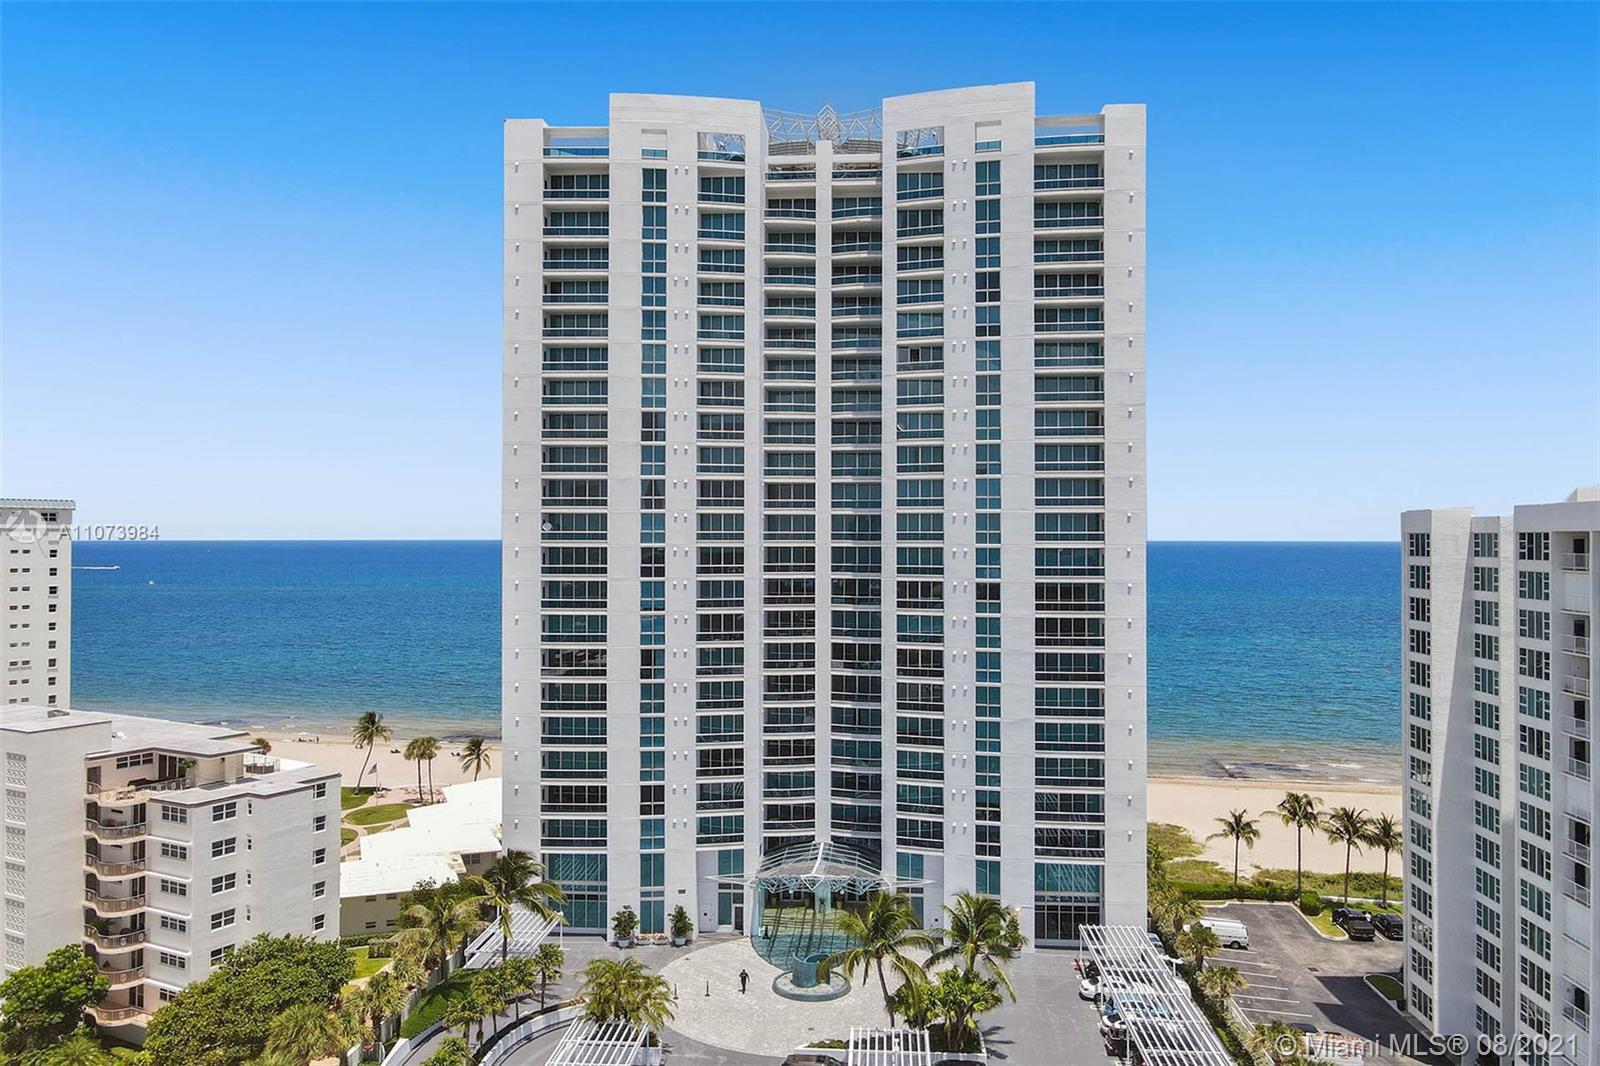 Spectacular beachfront condo with breathtaking ocean views in prestigious Aquazul. Exit your secure